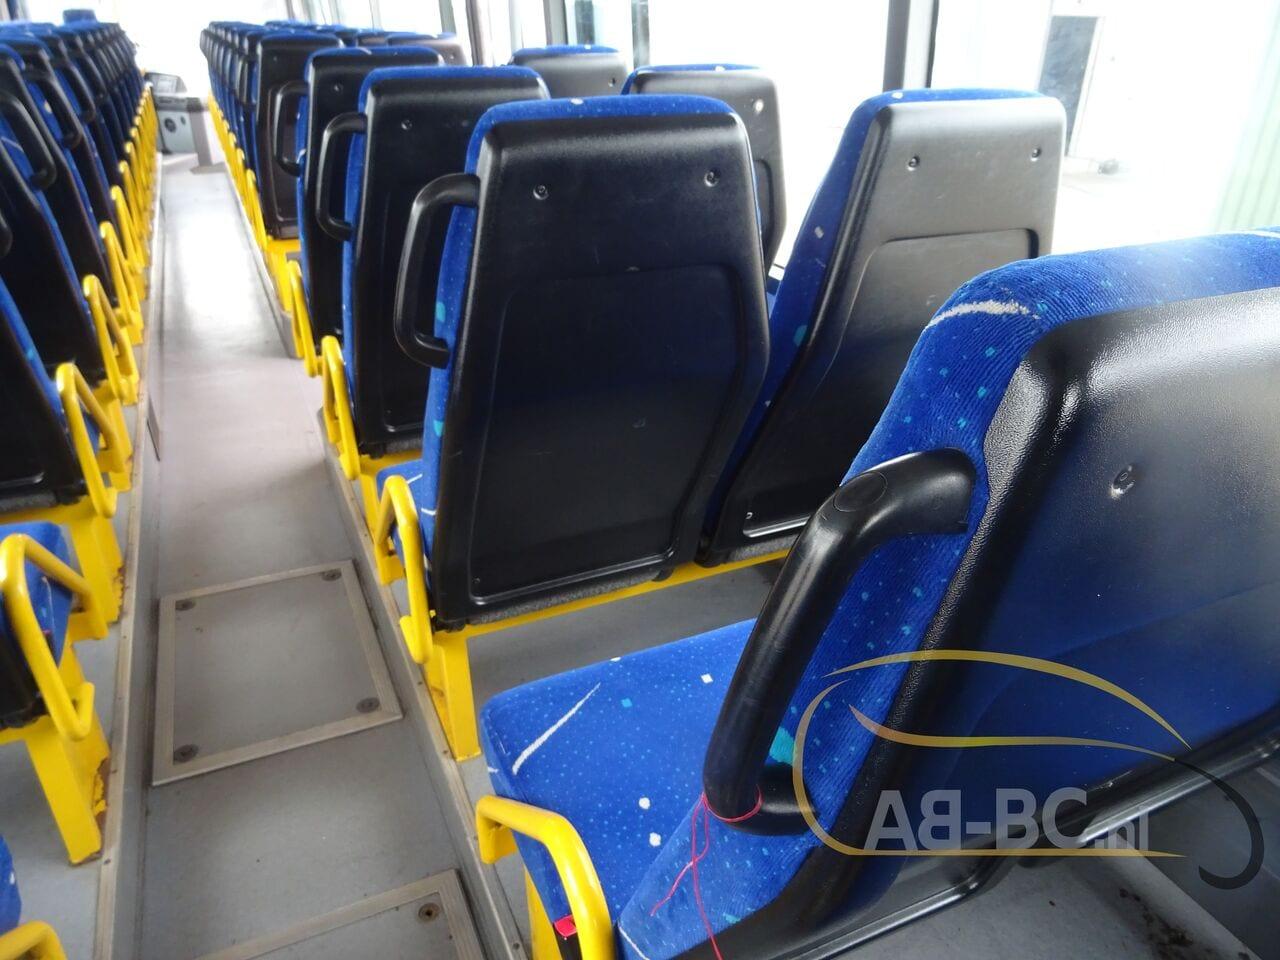 interurban-busIVECO-Irisbus-Recreo-64-Seats---1626160179821812972_big_5e73cc96504b1f9af98be31a235eb373--21071309575983154500